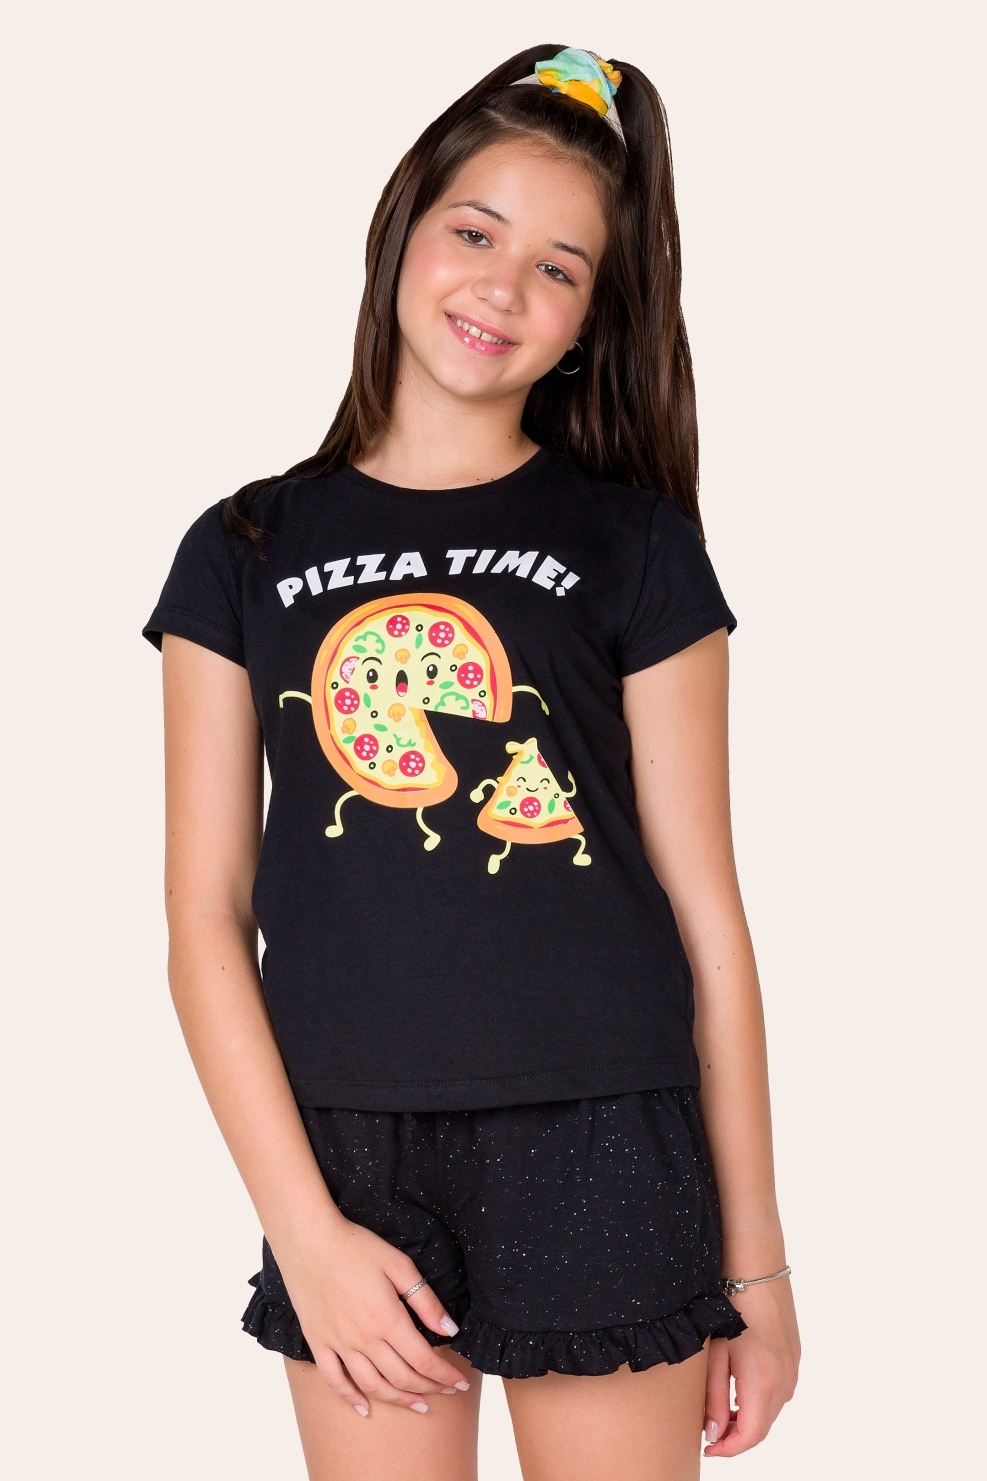 041/B - Pijama Juvenil Feminino  Pizza Time - Família